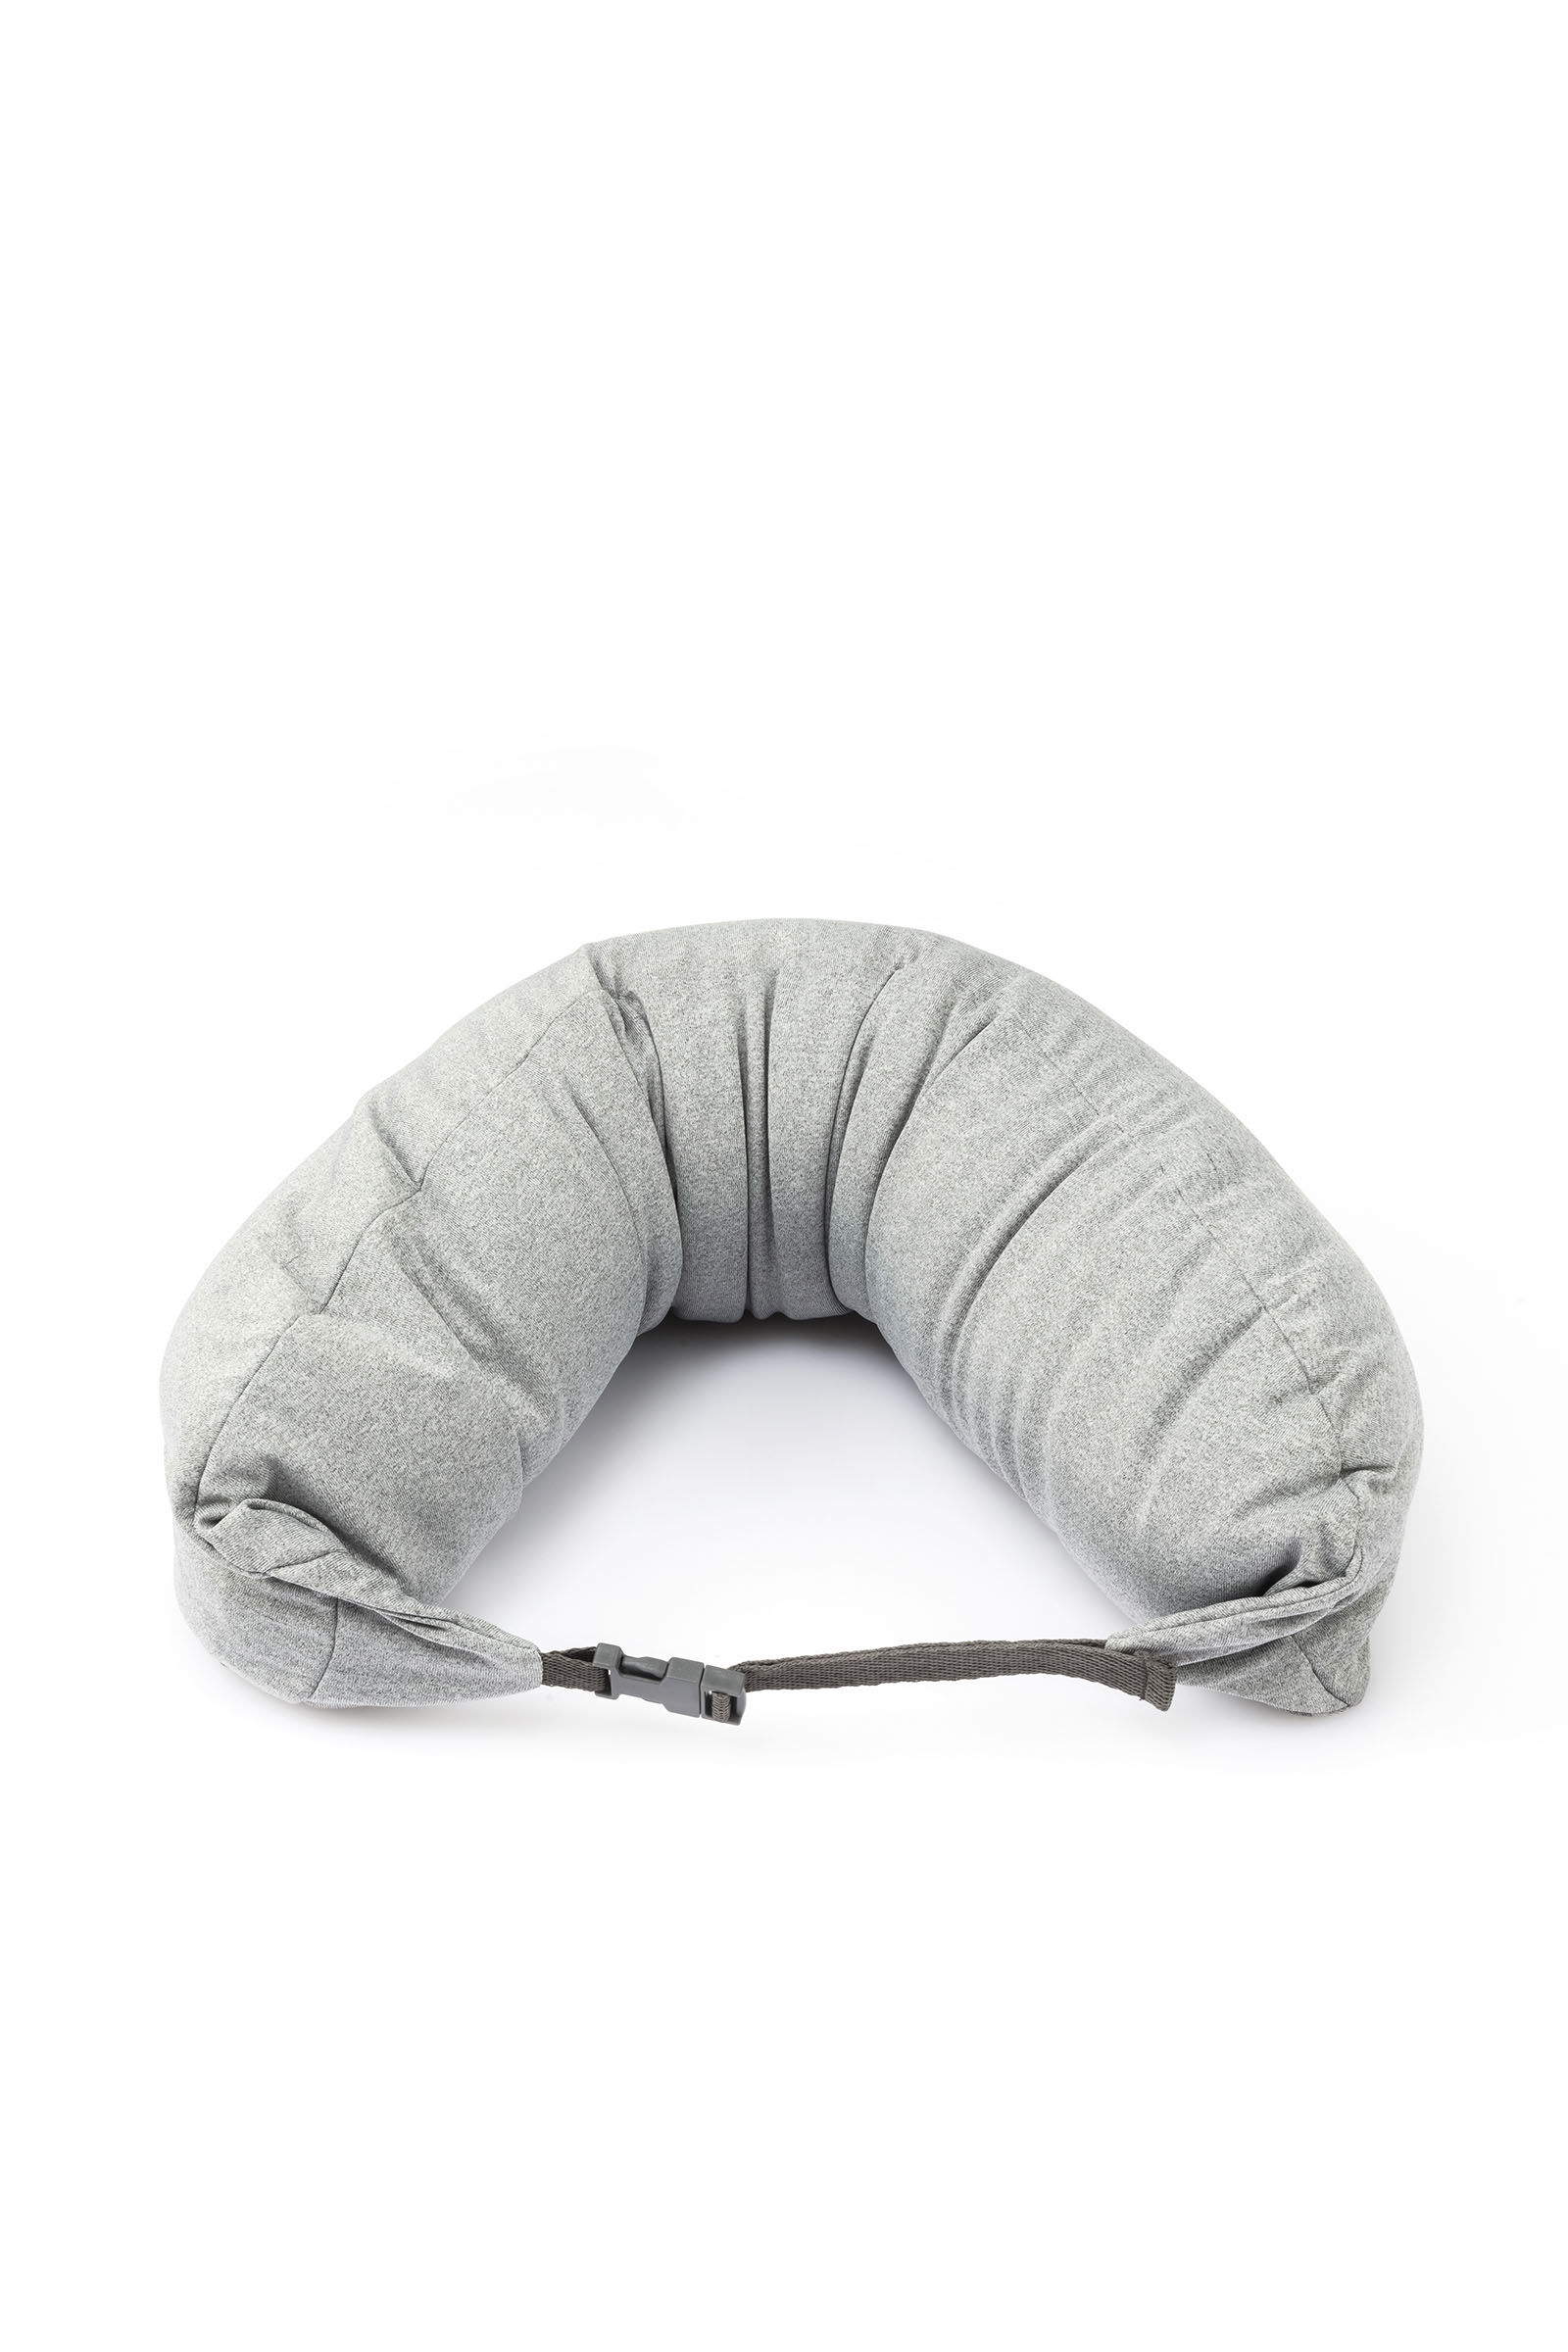 3 in 1 microbead pillow